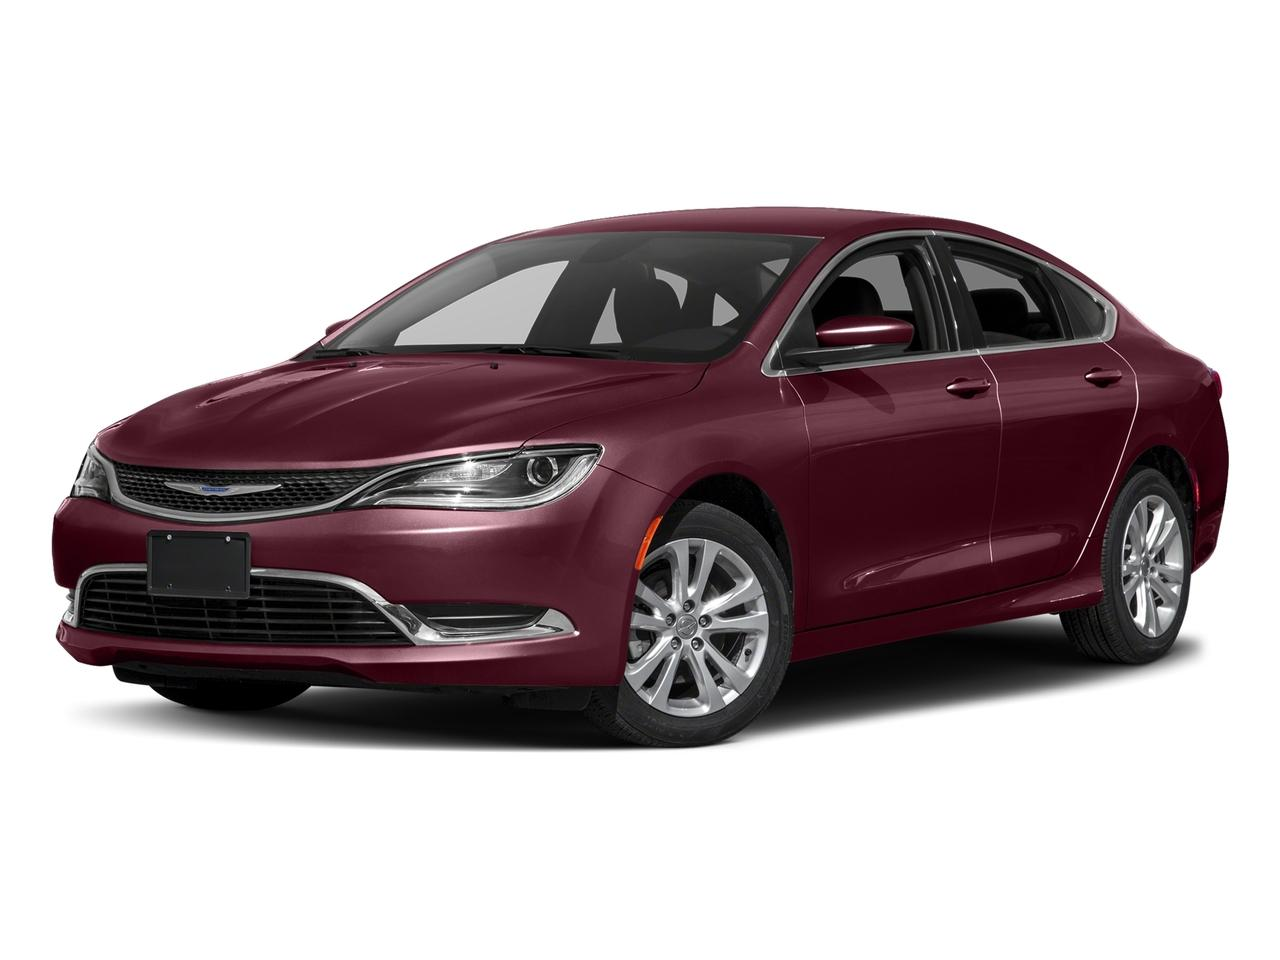 2017 Chrysler 200 Vehicle Photo in Killeen, TX 76541